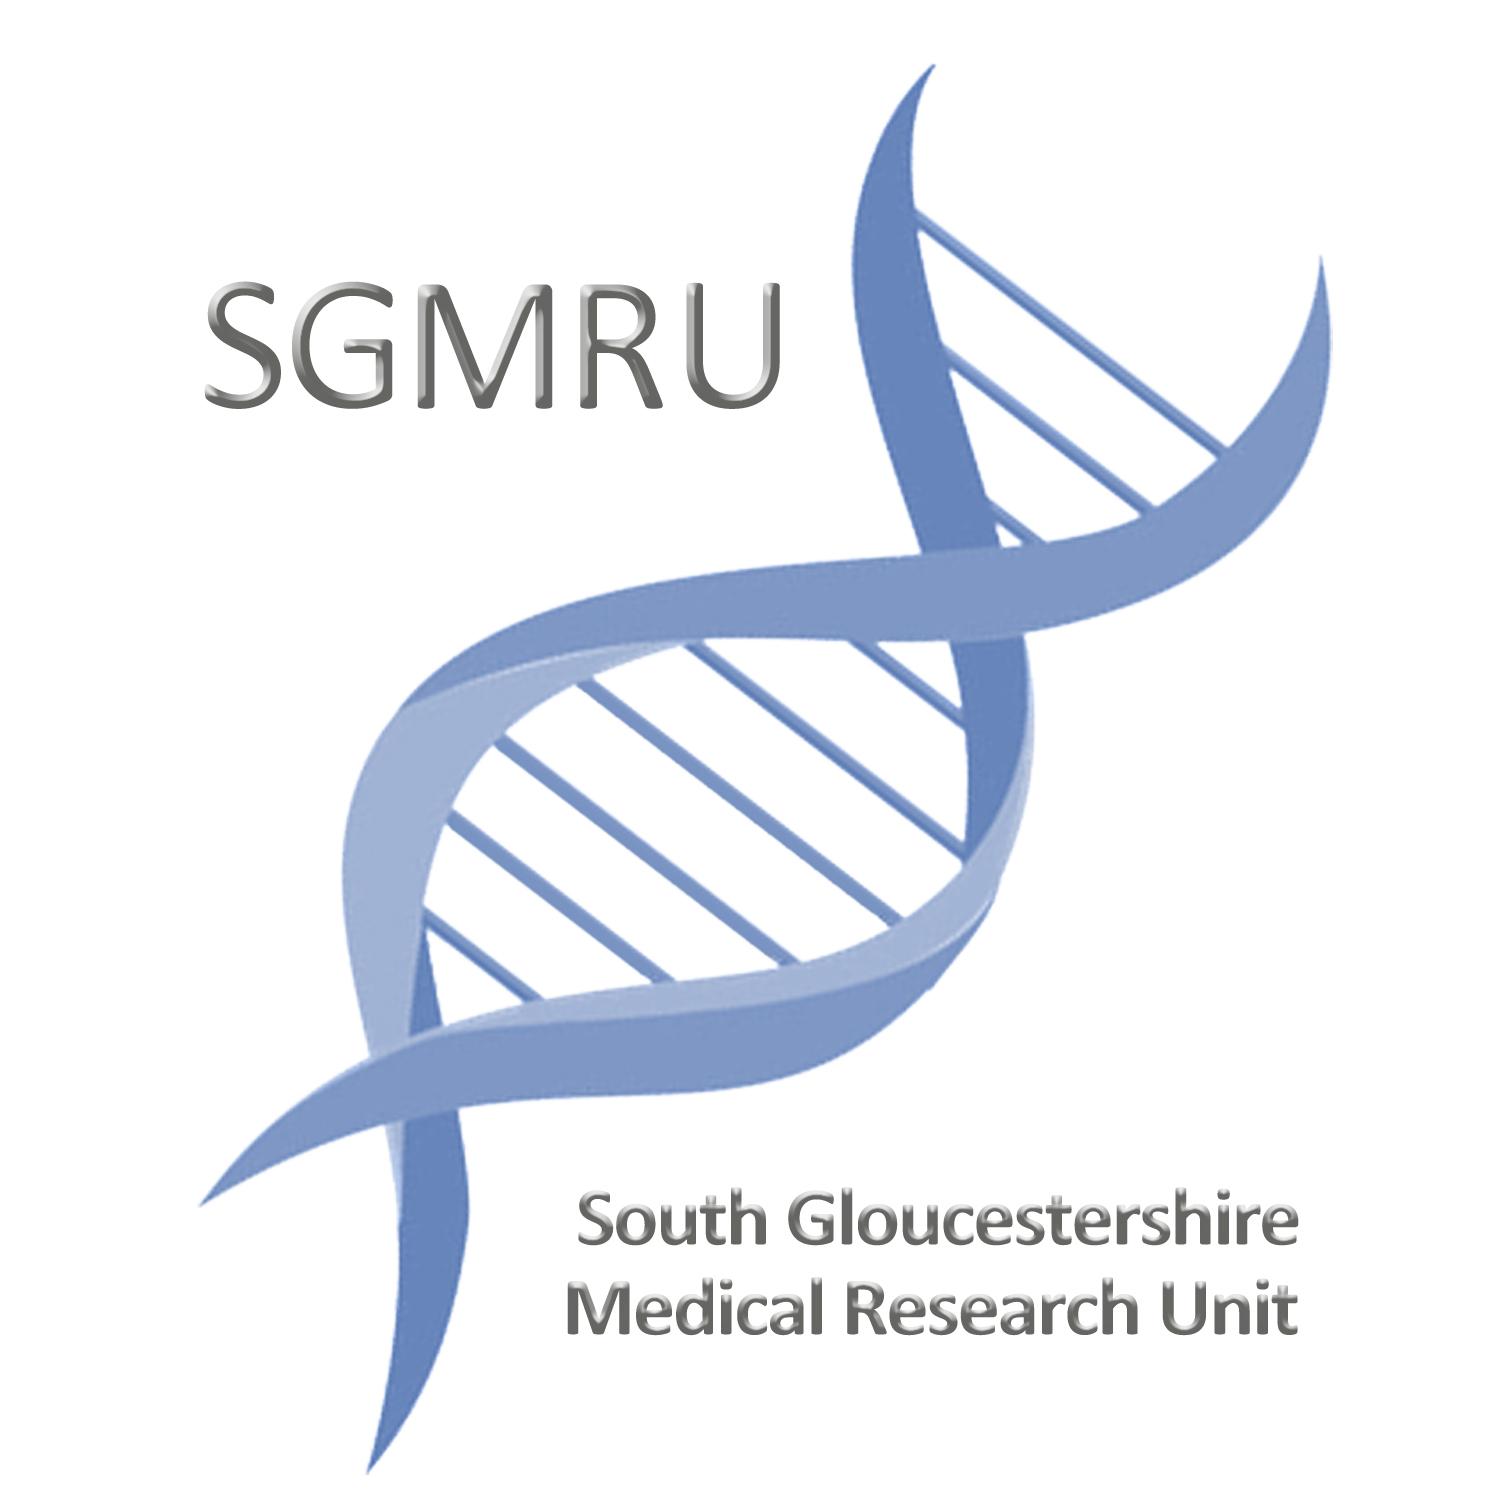 SGMRU logo